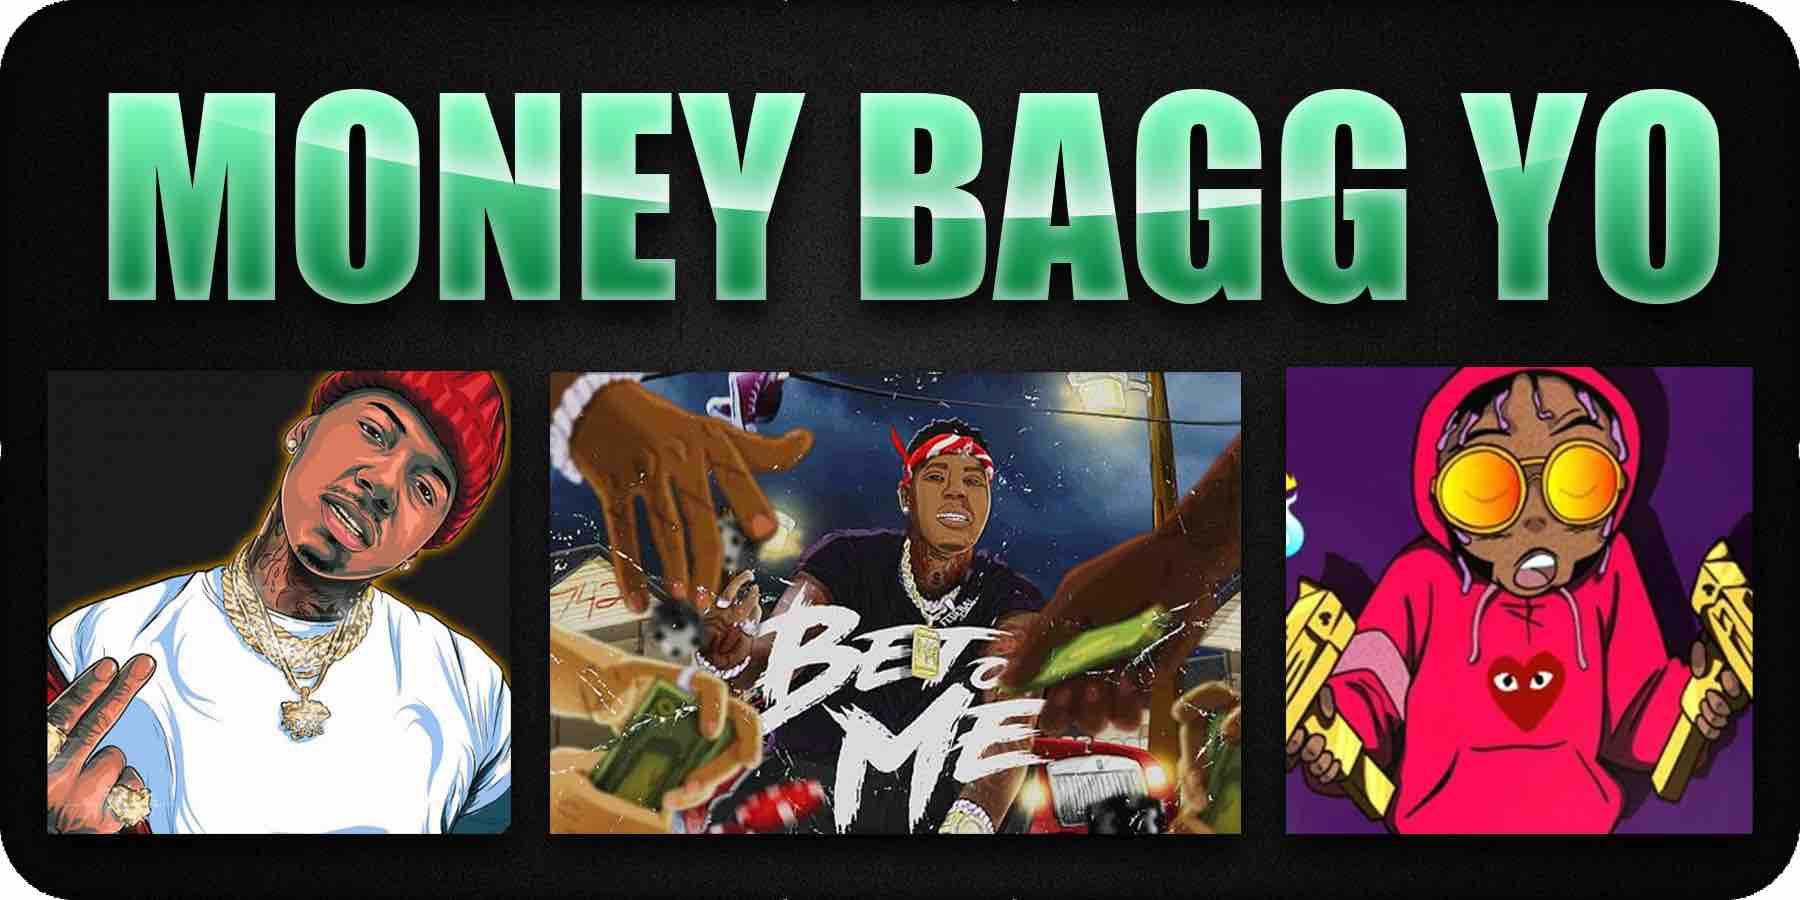 Money Bagg Yo cartoon cover art